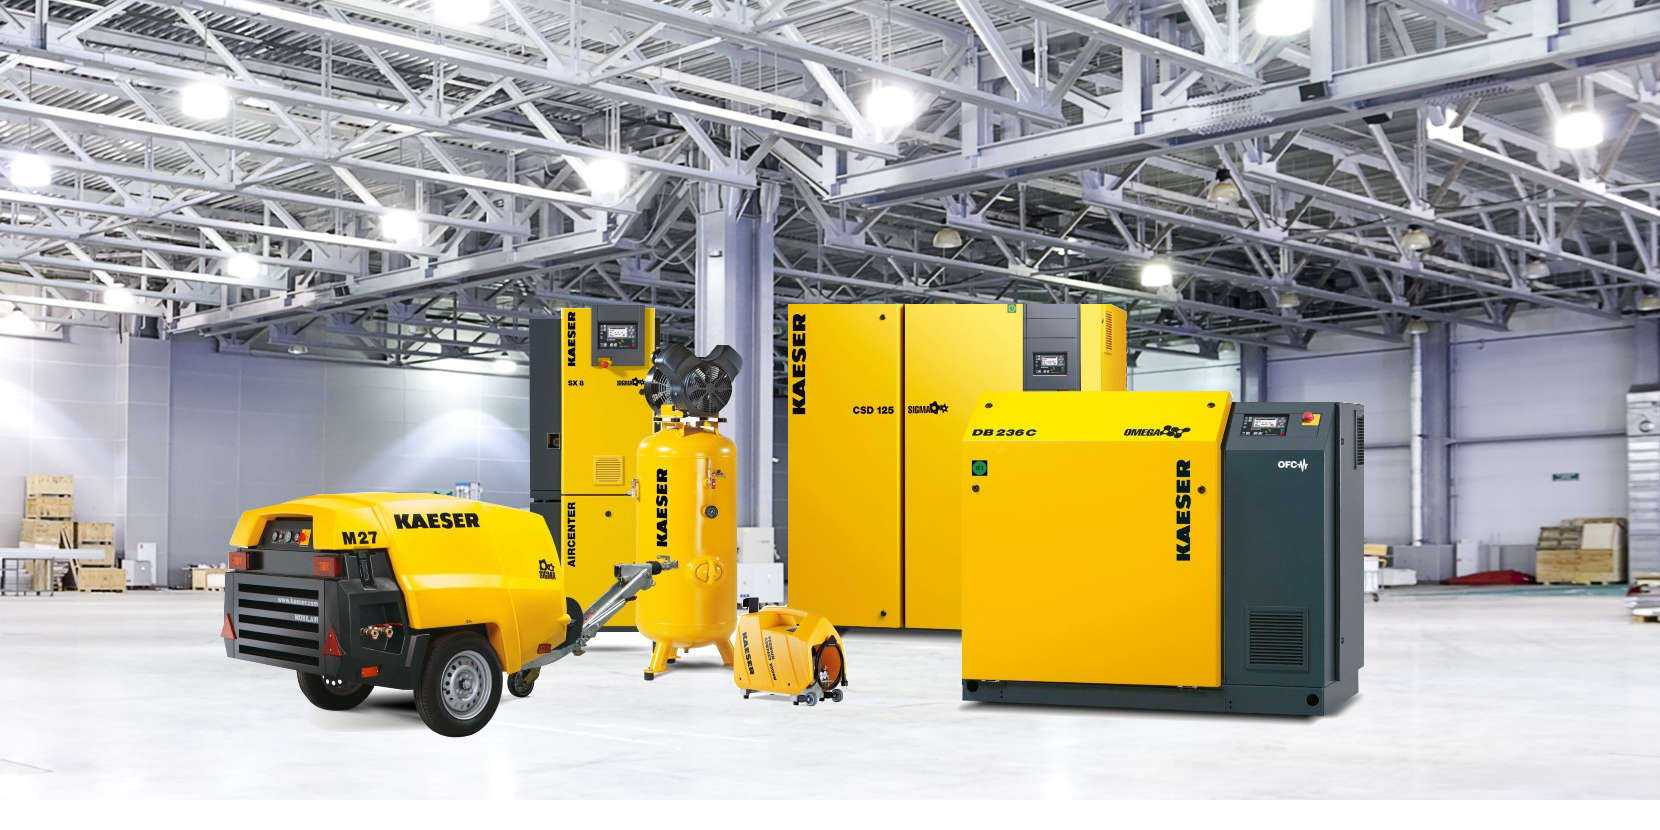 KAESER Air Compressors in Ghana